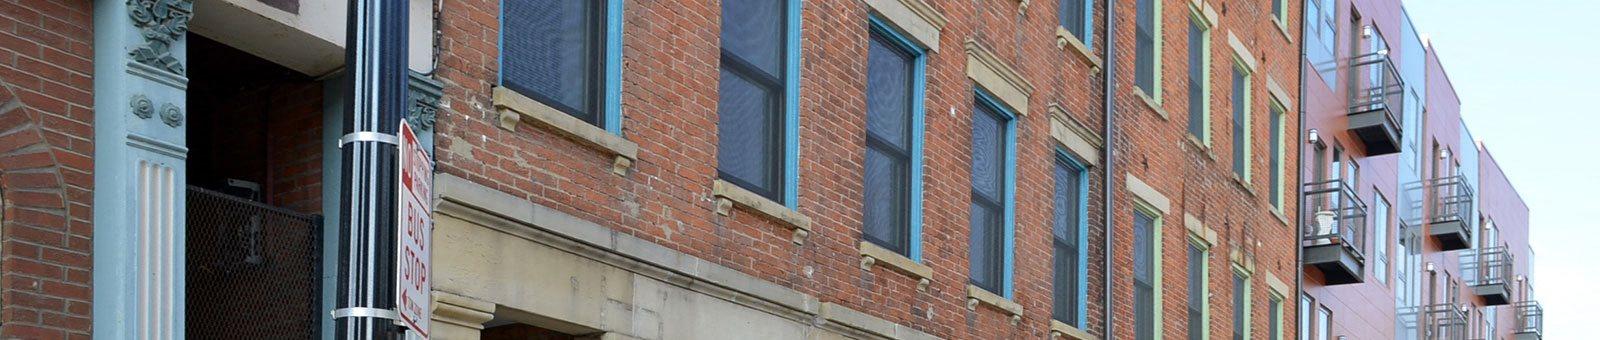 Exterior-Mercer Commons Apartments Cincinnati, OH